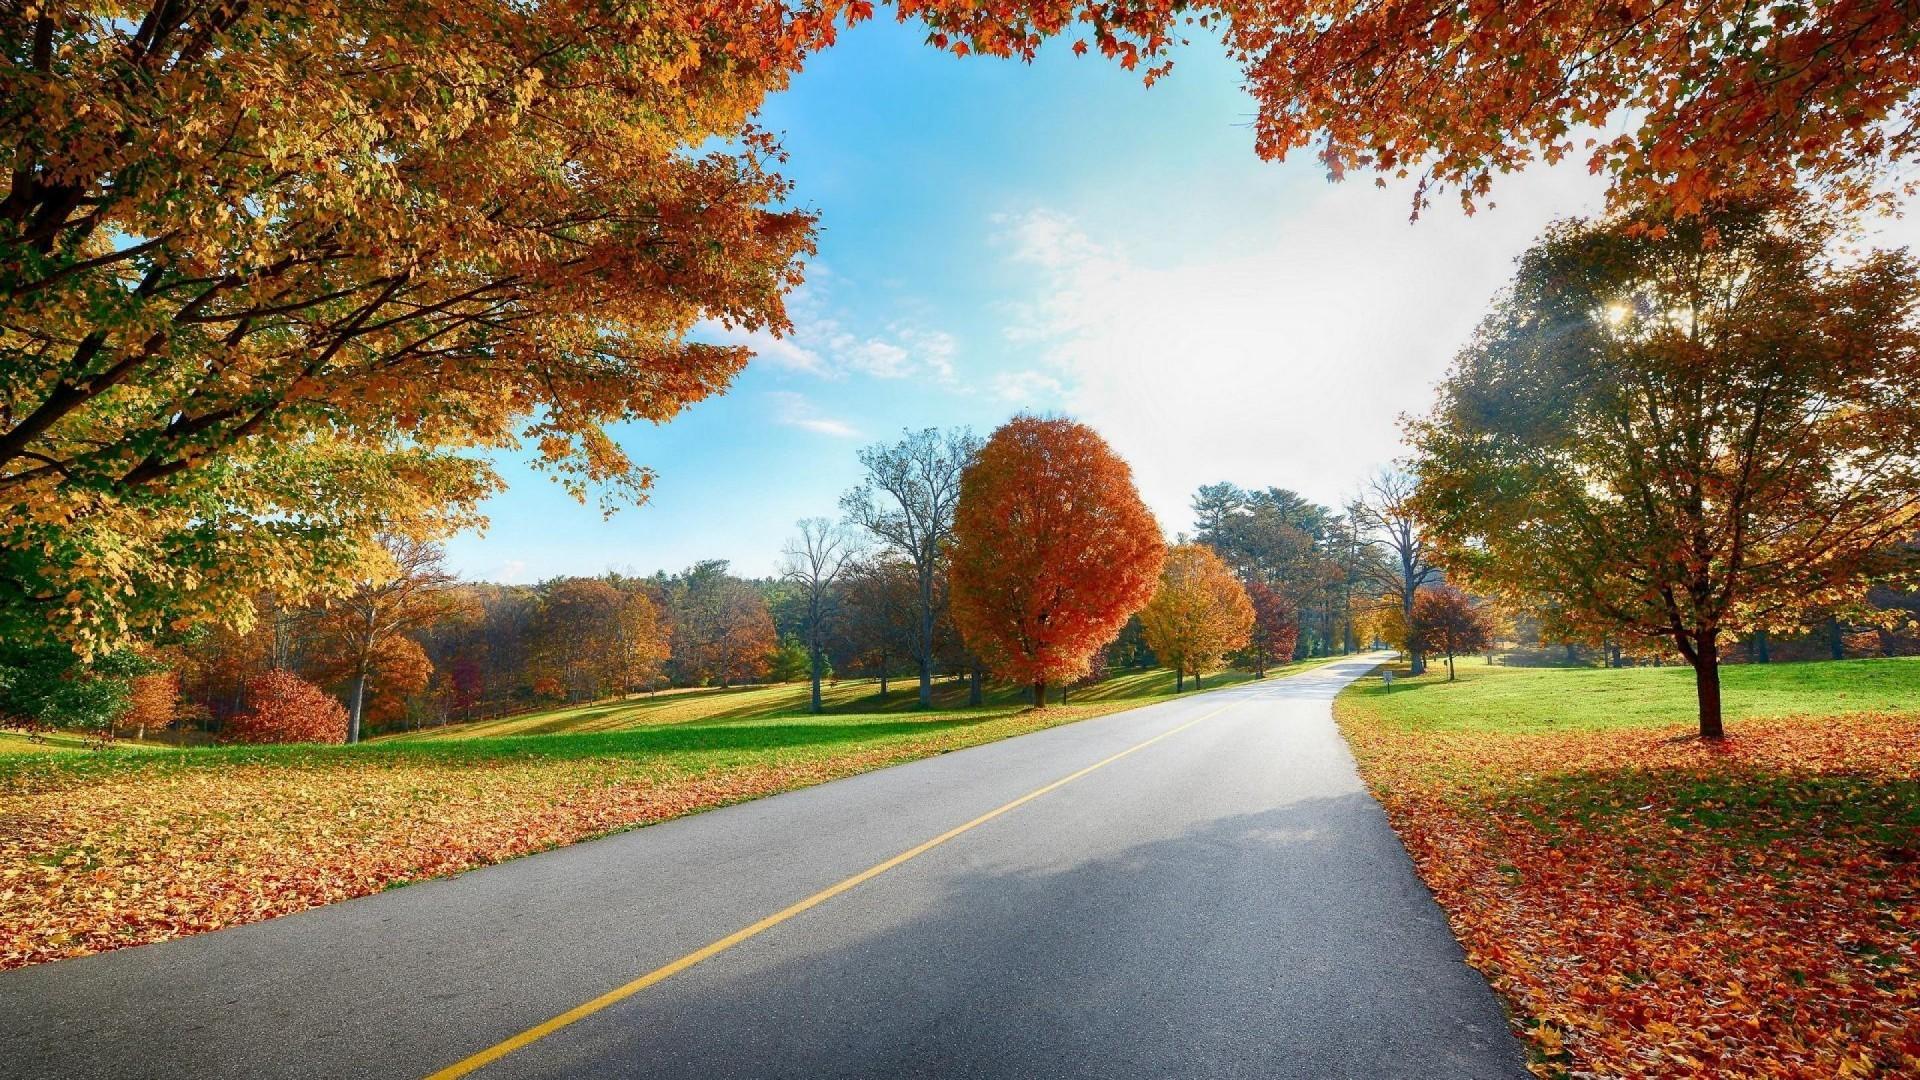 HD Wallpaper Nature 1080p Fall | HD Wallpapers Nature